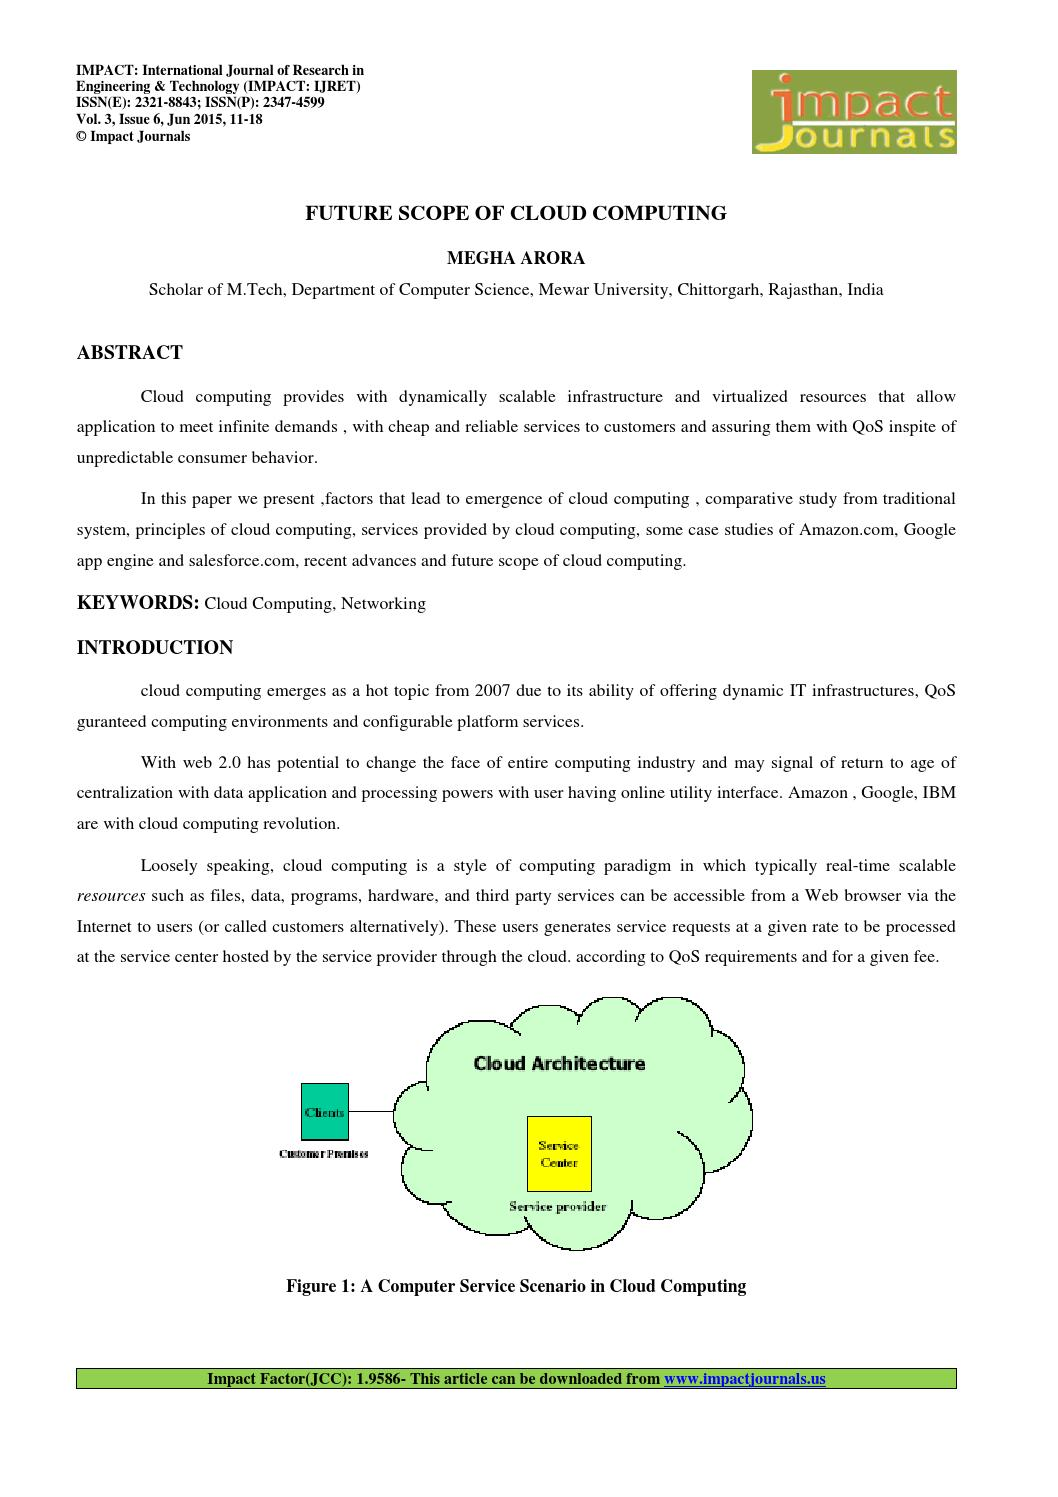 2 eng future scope of cloud computing megha arora